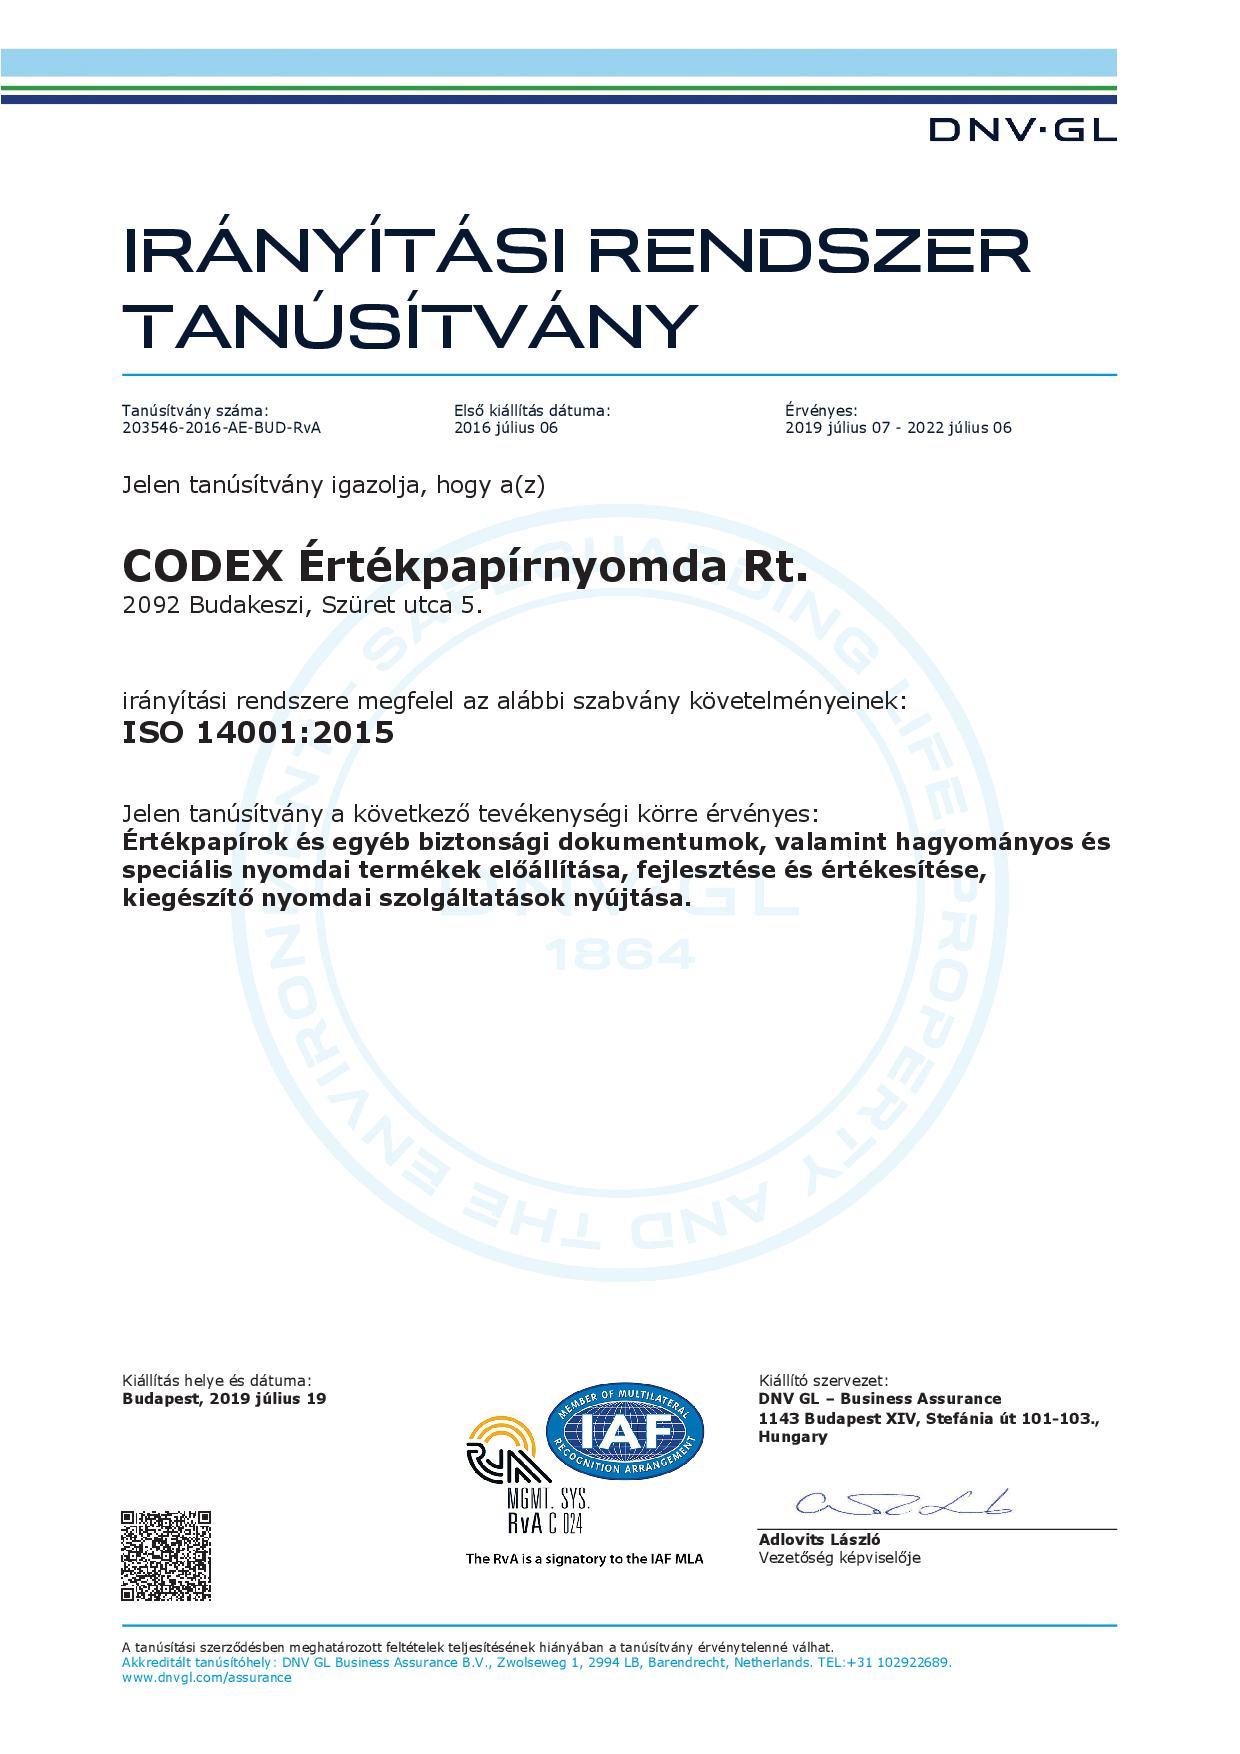 DNV_GL_Certificate_HUN_14001